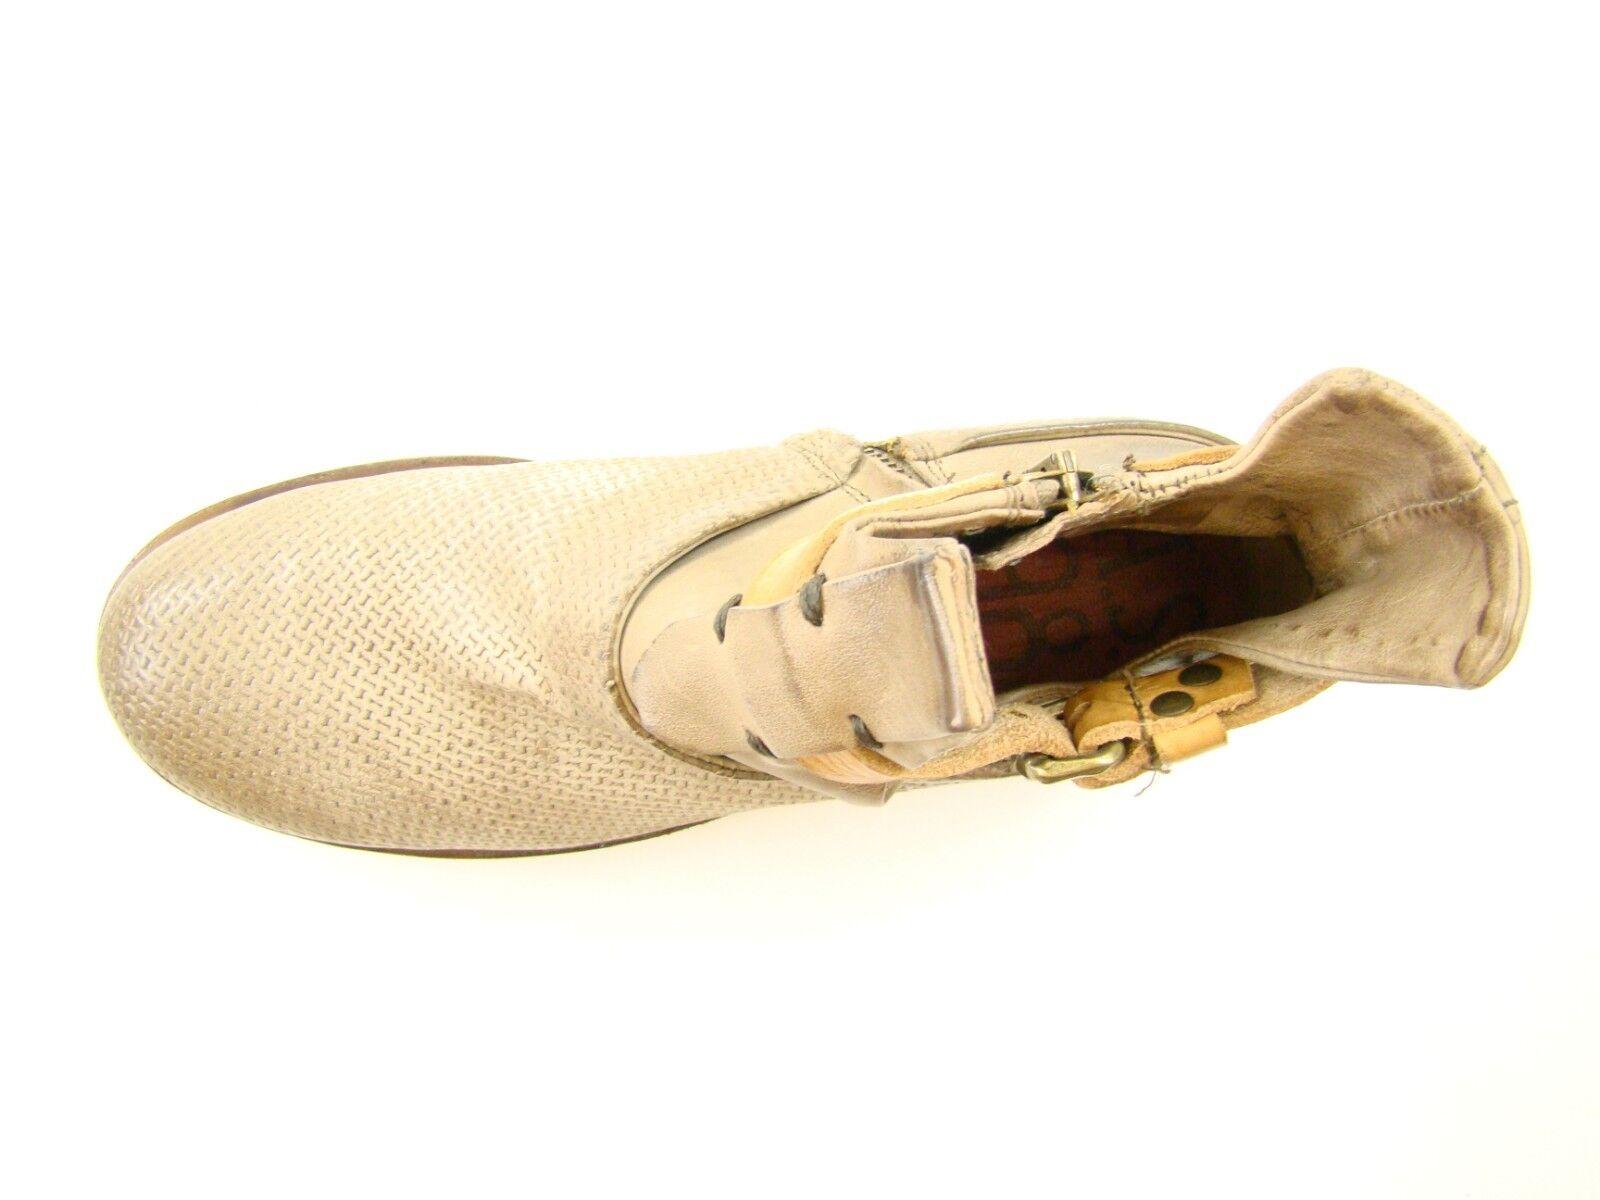 6621 A.S.98 Stiefel Schnallen 36 NEU Damen Lederstiefel Leder Schnallen Stiefel Stiefel Stiefeletten c790e5